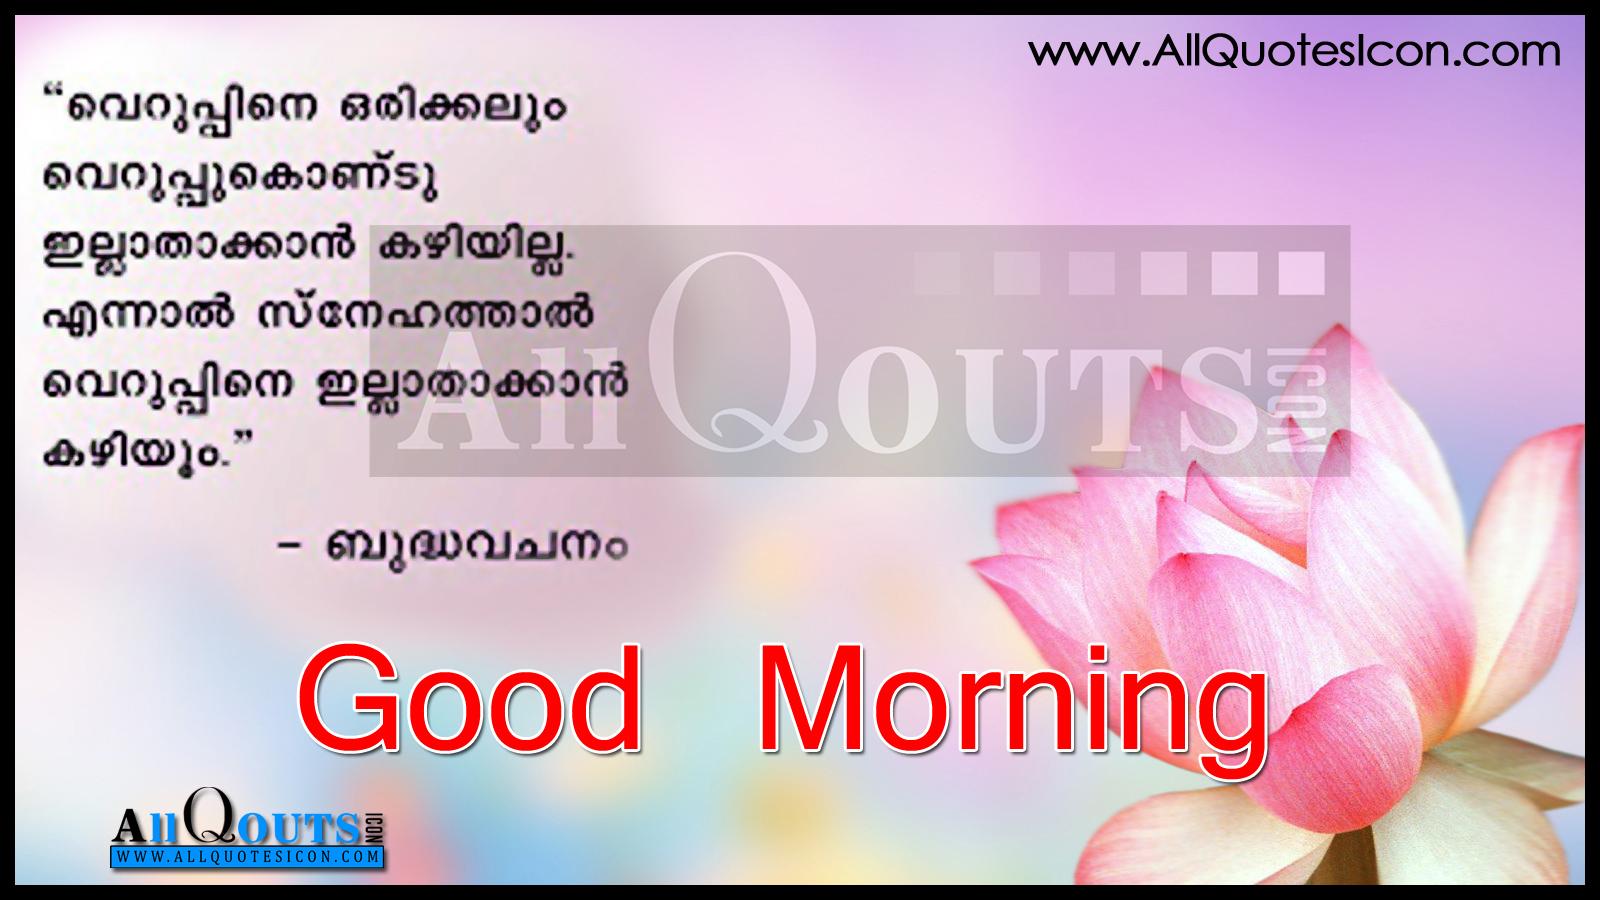 good morning wishes in malayalam beautiful gautama buddha